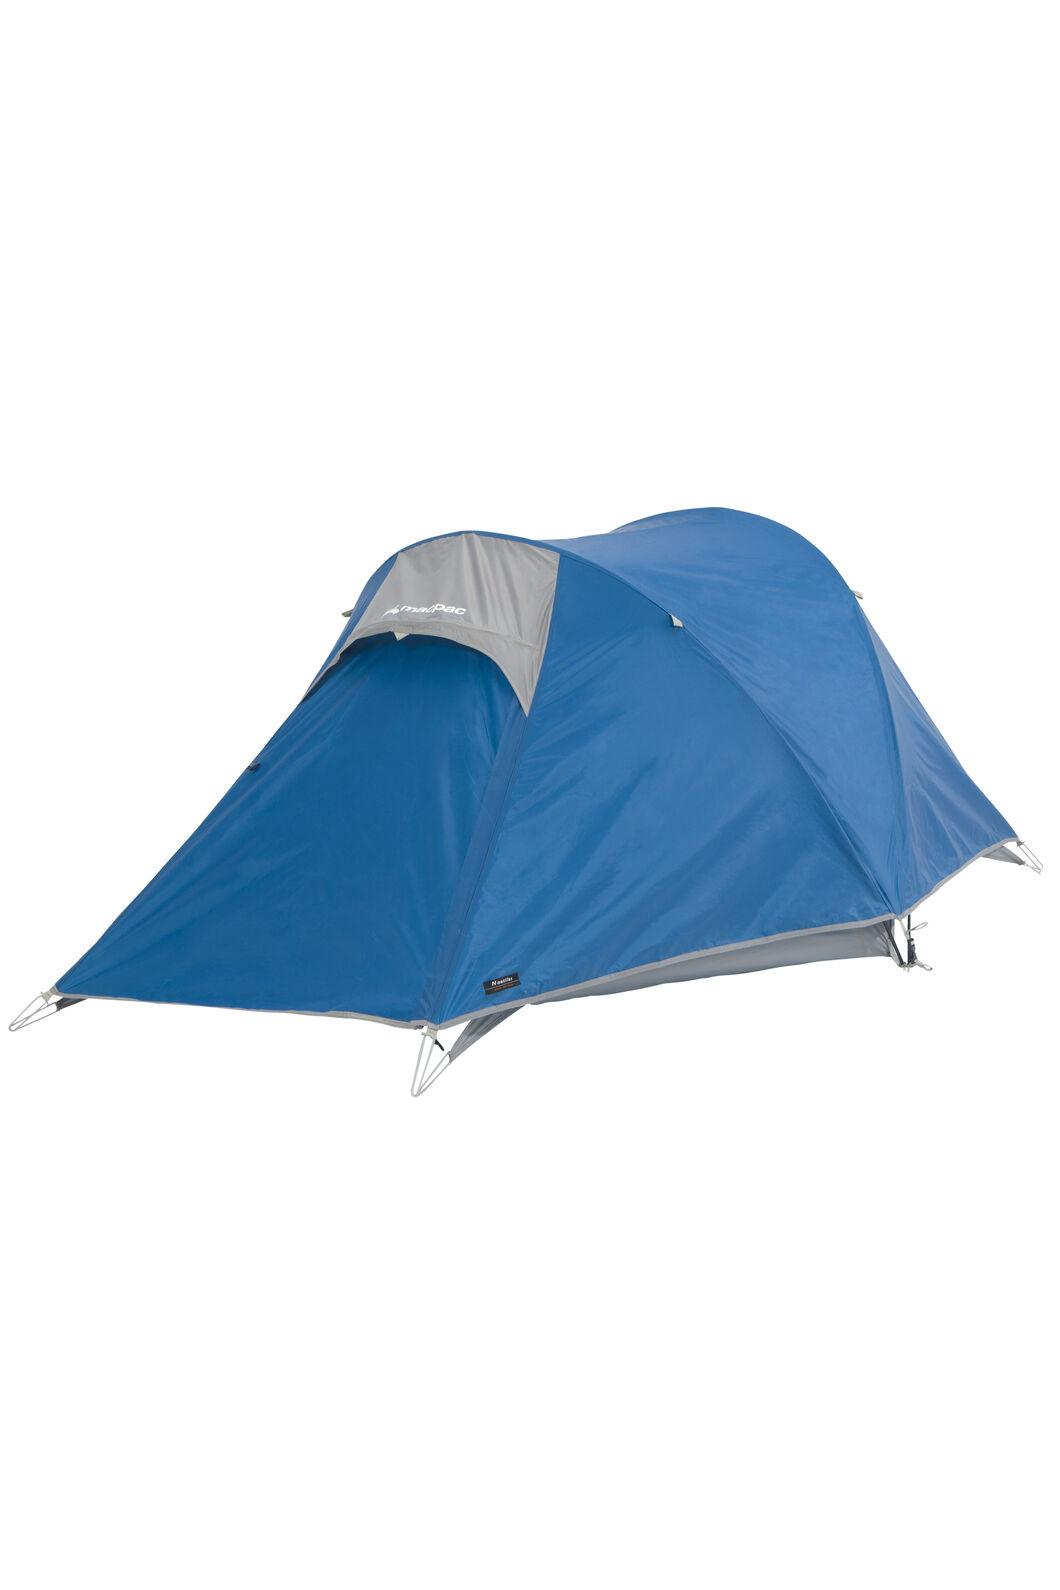 Macpac Nautilus Camping Tent, Imperial Blue, hi-res